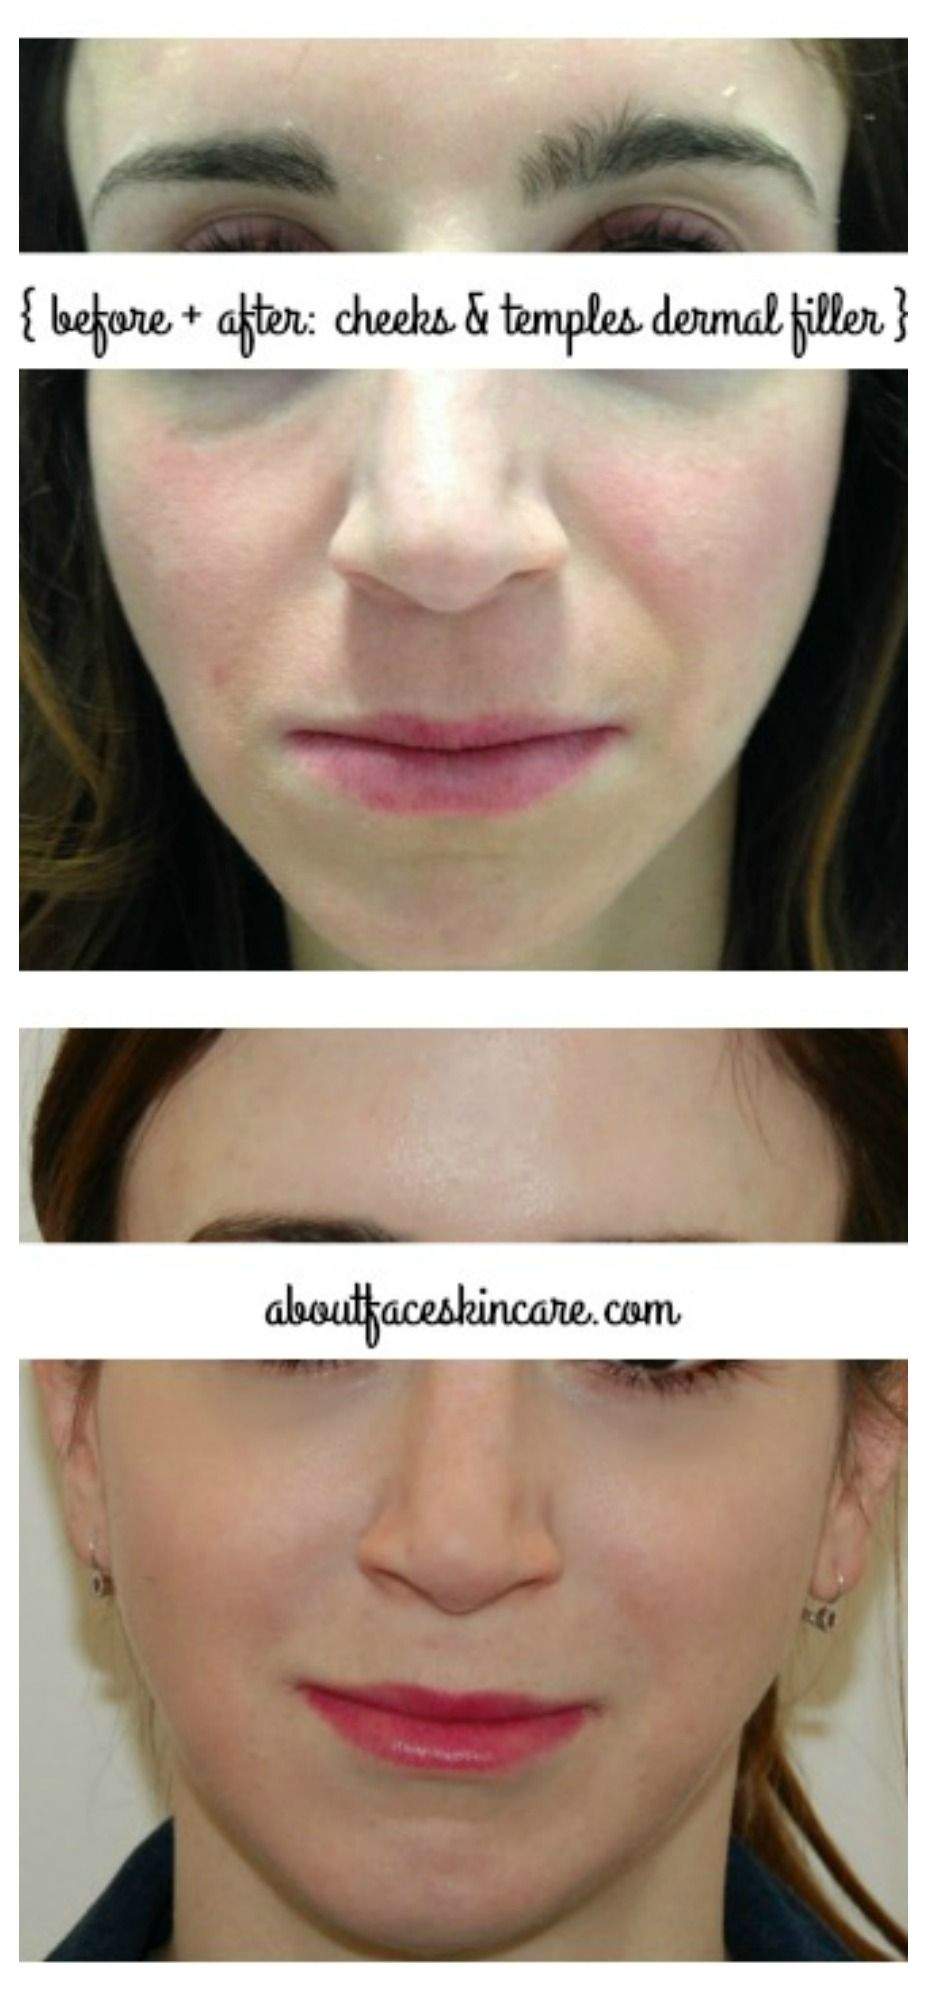 Facial filler injections - Sports stores atlanta